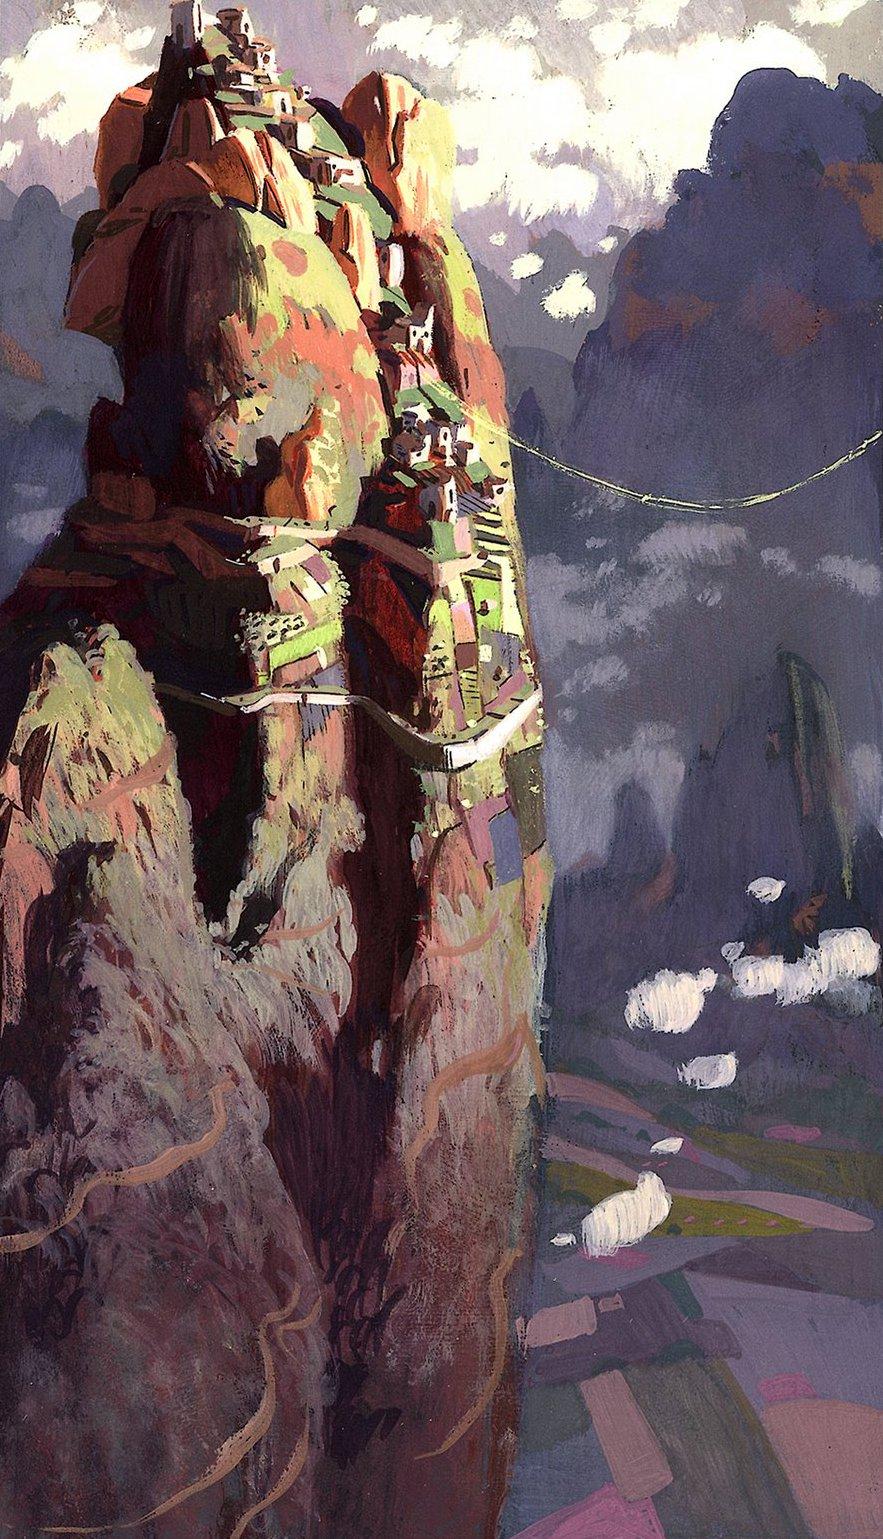 Kuzco, l'Empereur Mégalo [Walt Disney -2001] - Page 6 EWZLUCJWAAEmIS5?format=jpg&name=large